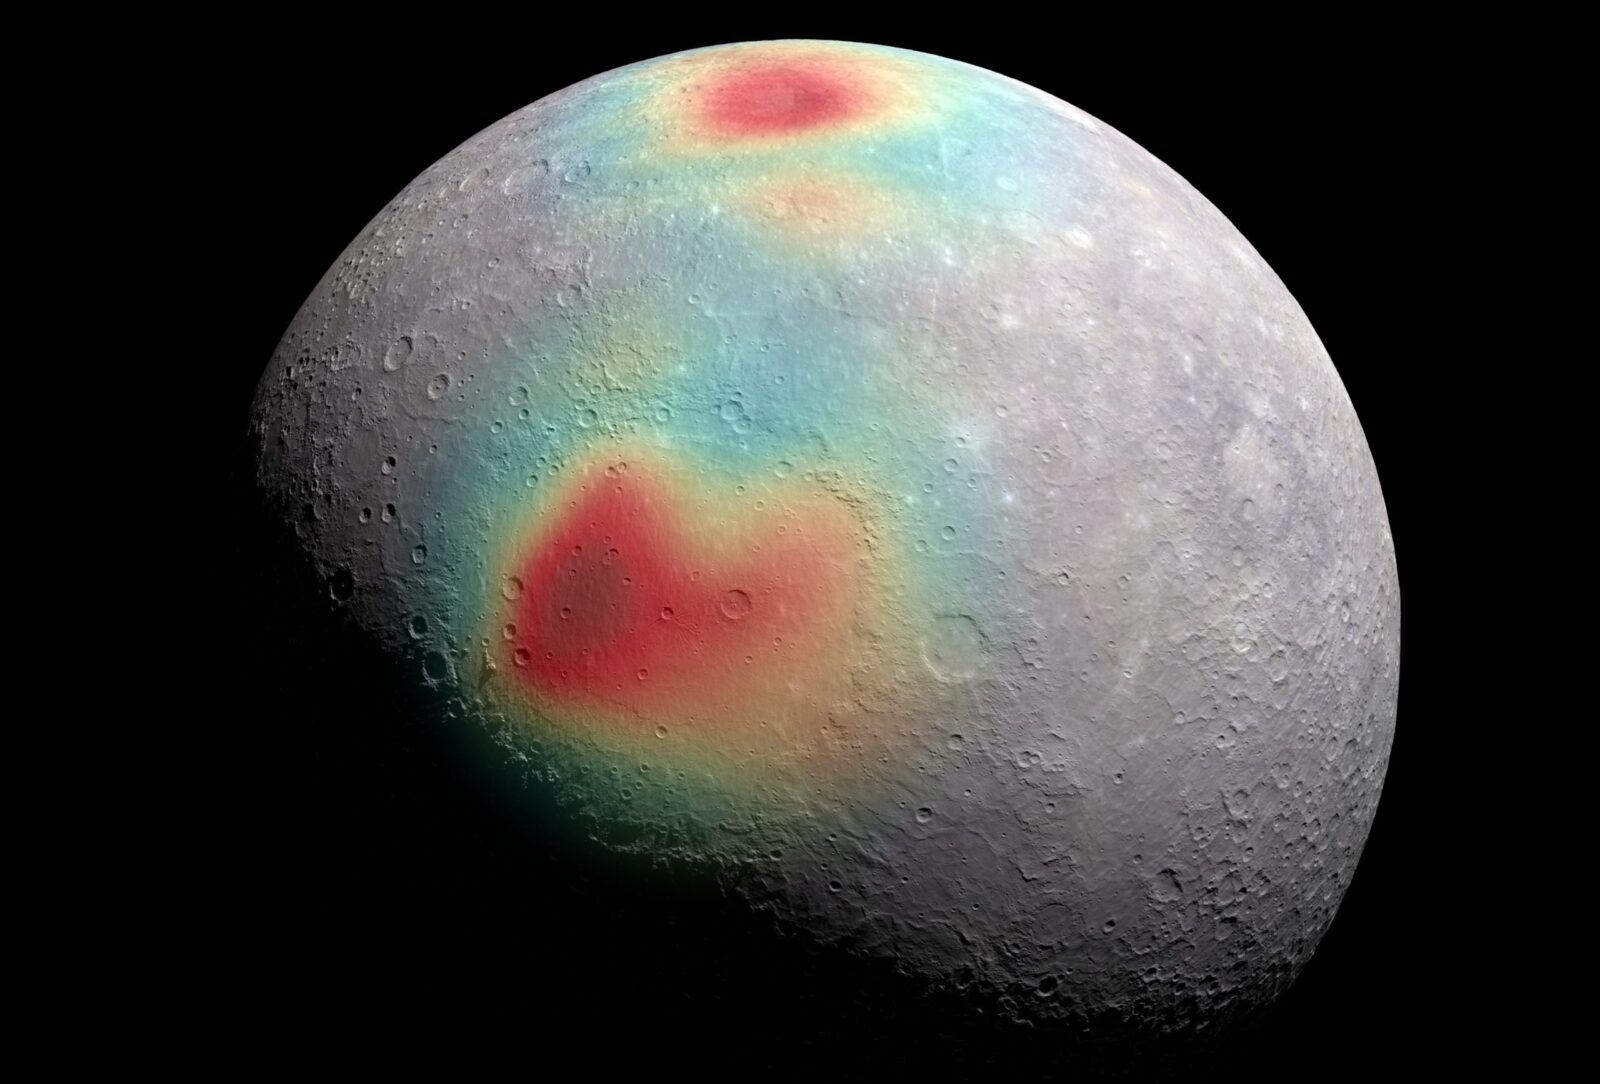 Миссия на Меркурий: продолжение